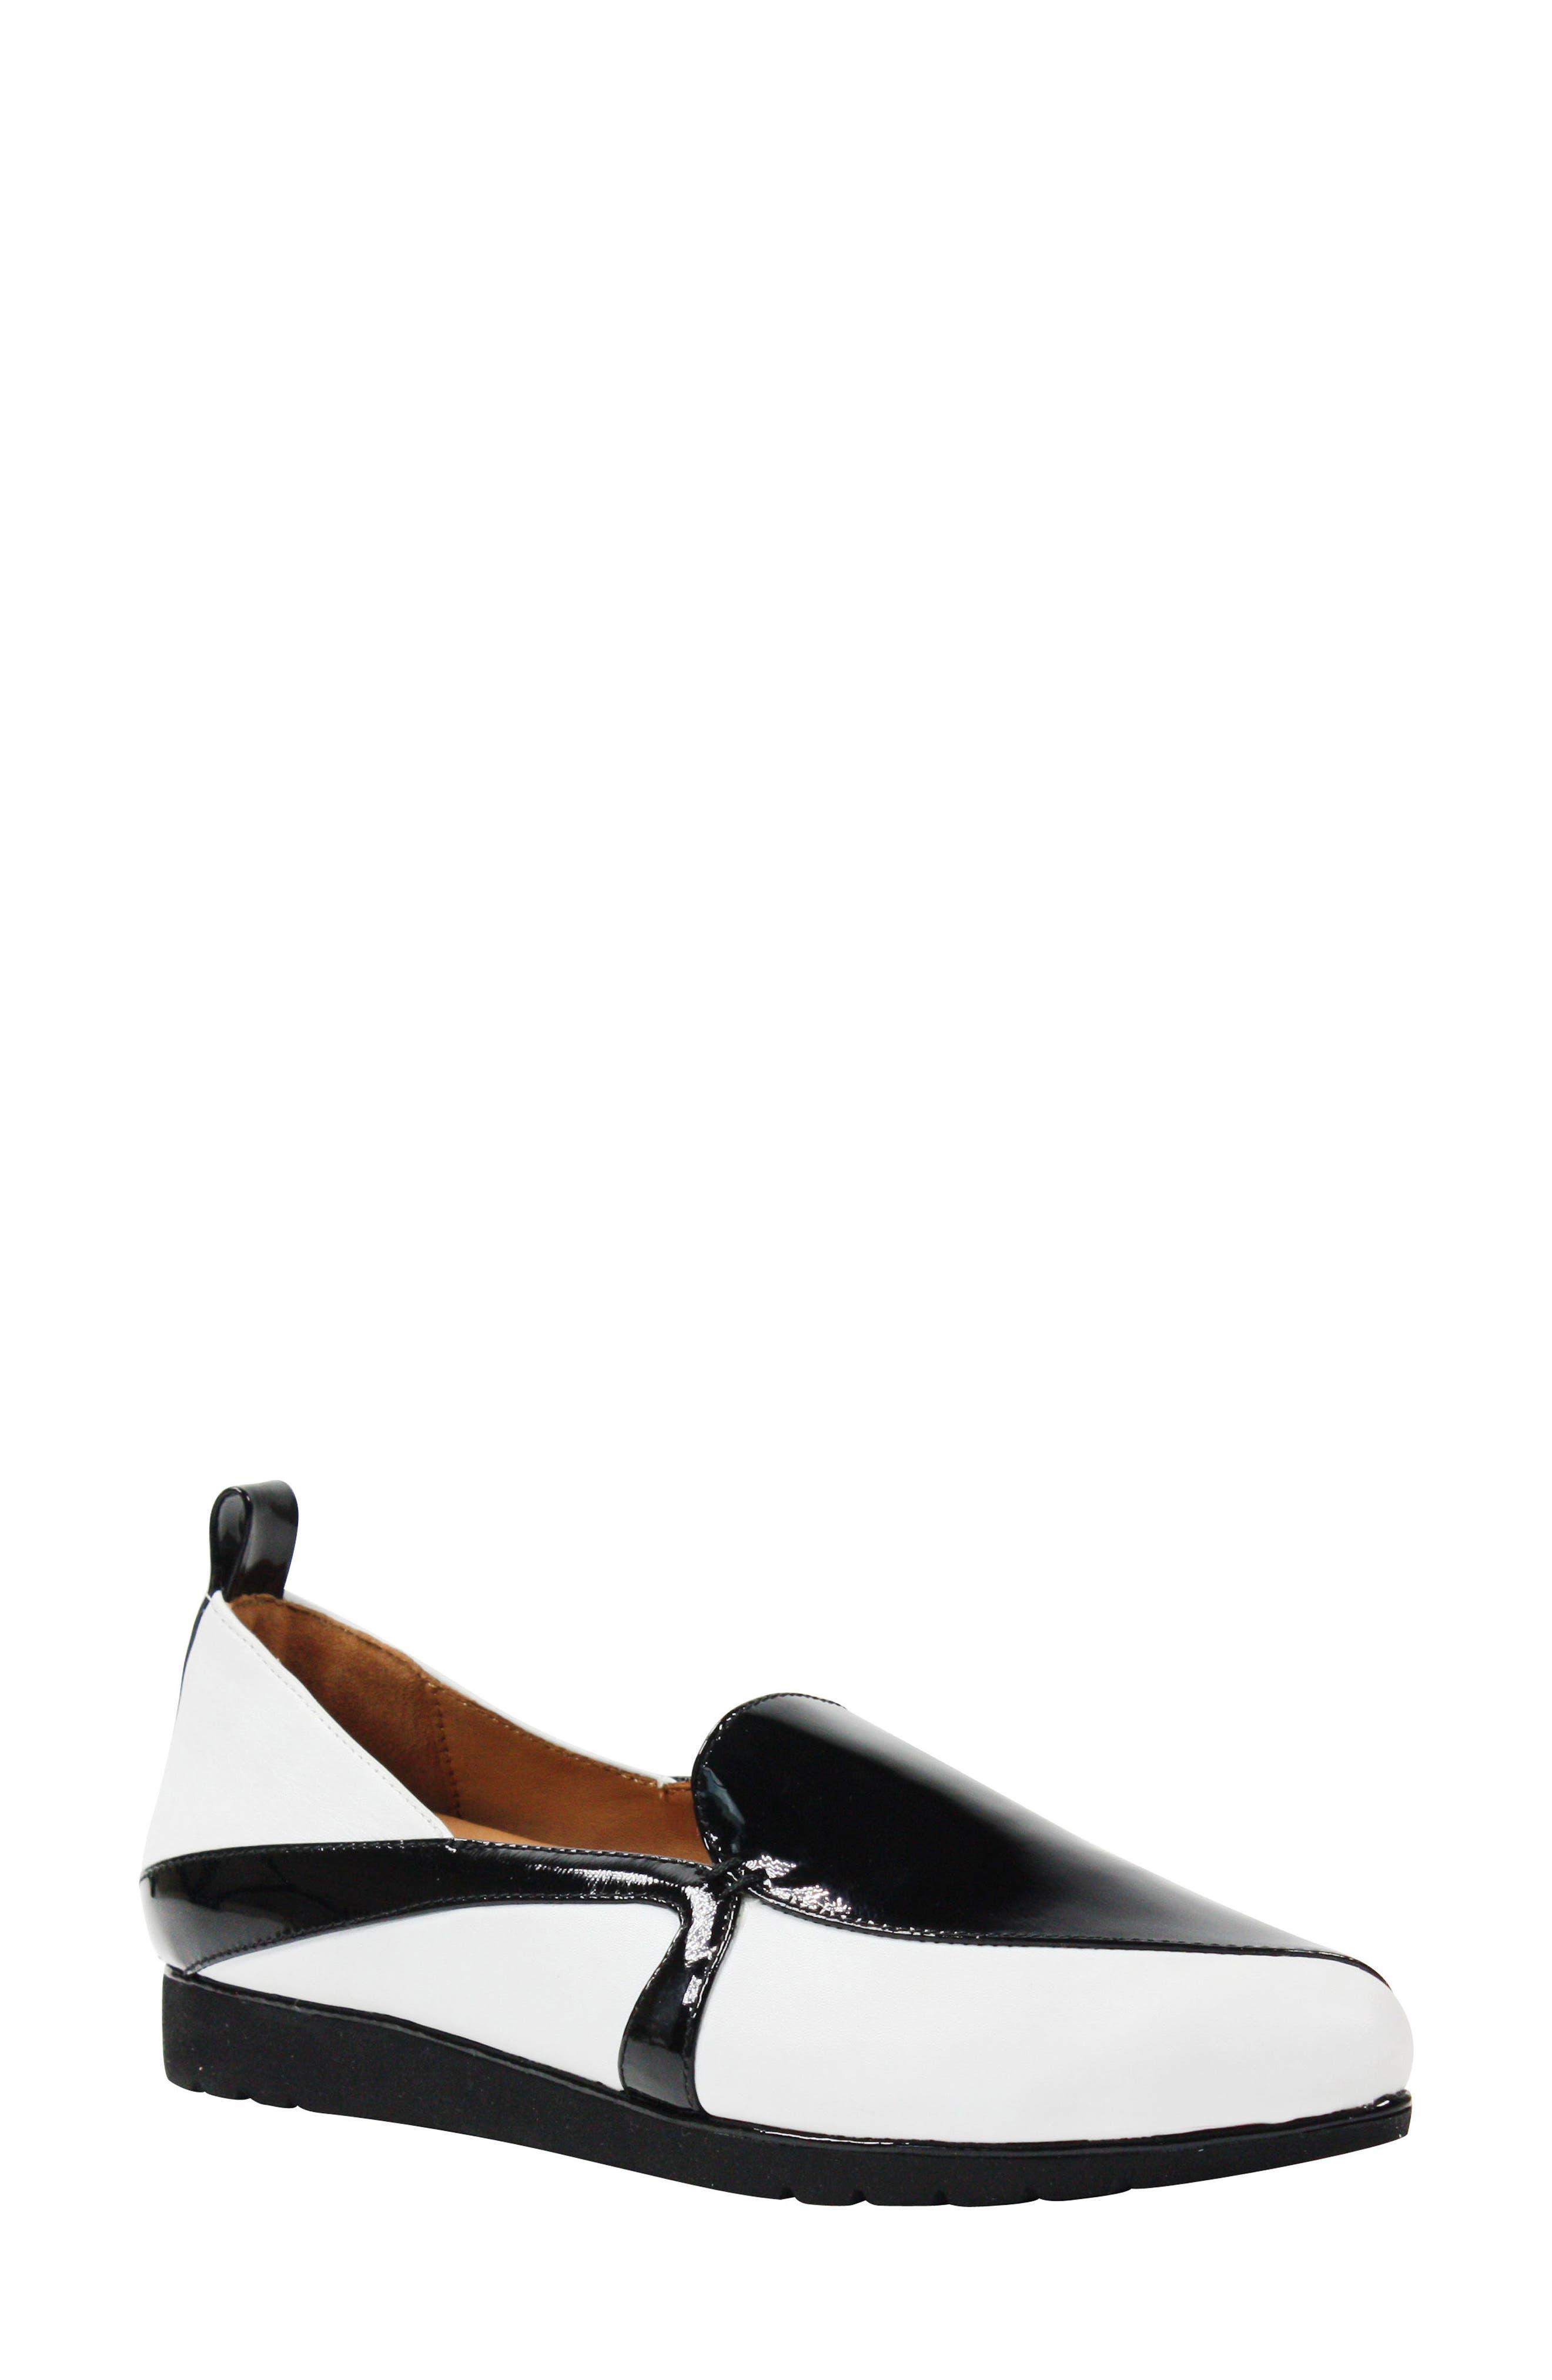 Marjolaina Loafer,                             Main thumbnail 1, color,                             Black/ White Patent Leather